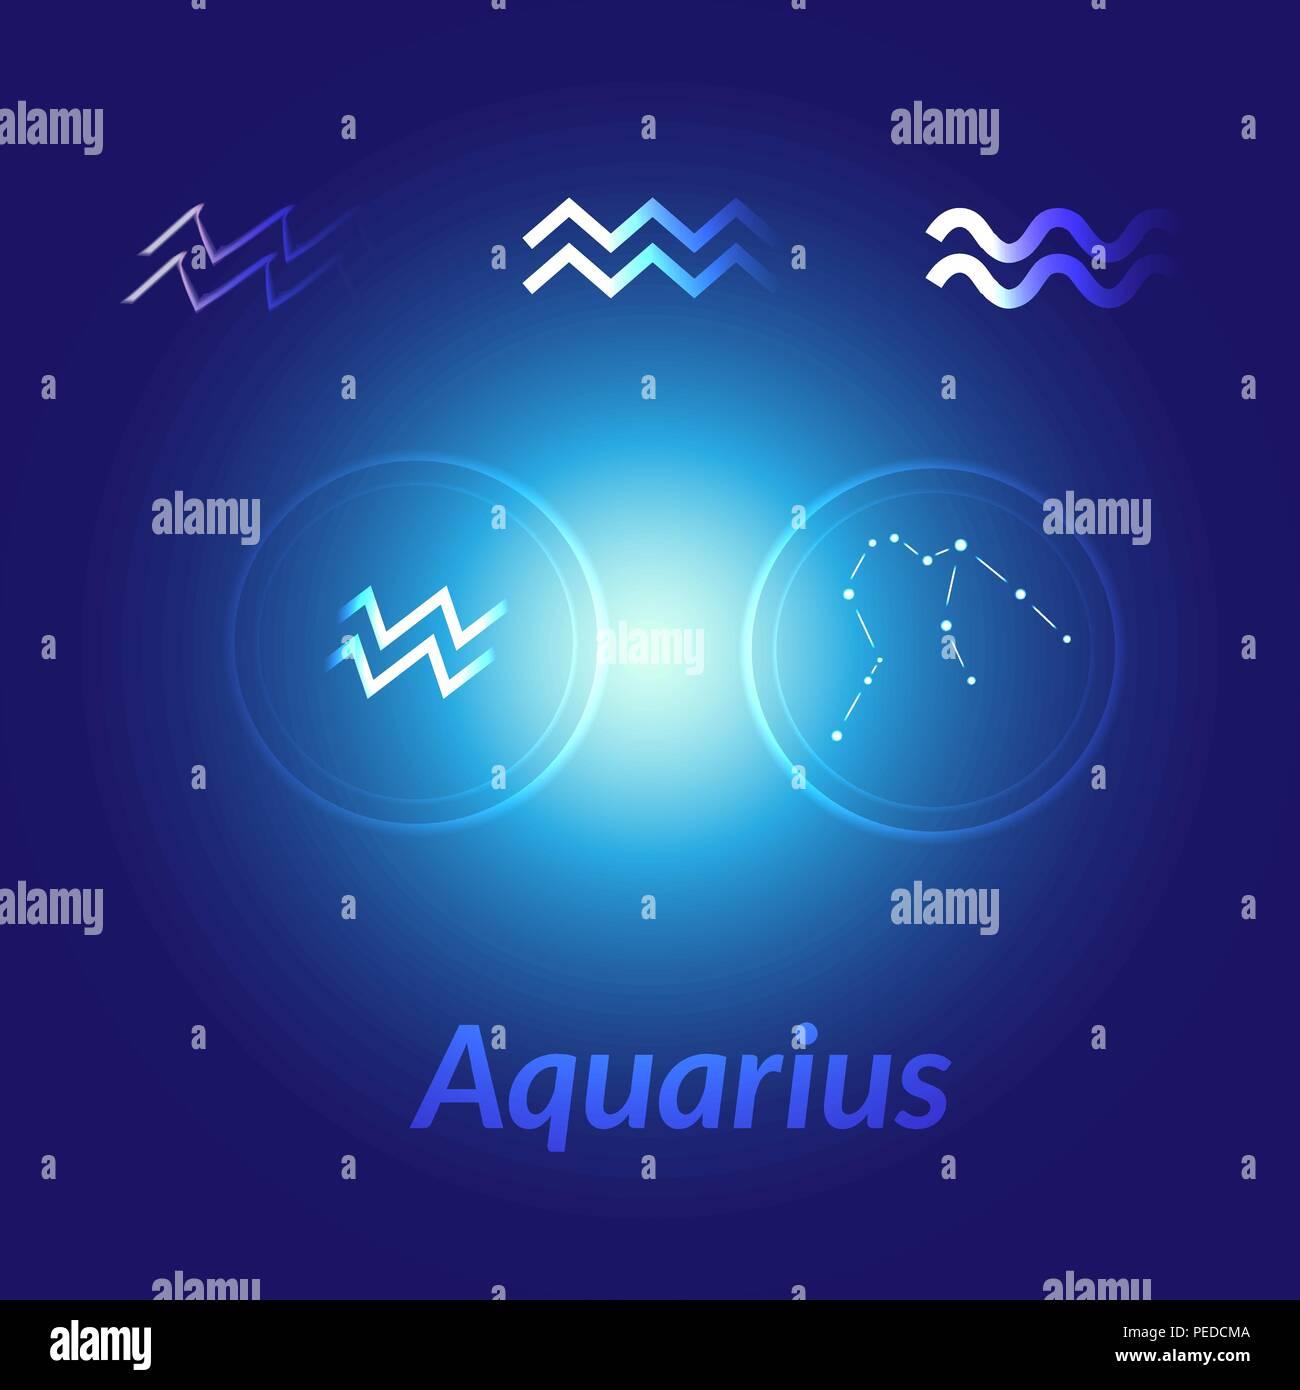 The Water-Bearer aquarius sings set. Star constellation vector element. Age of aquarius constellation zodiac symbol on dark blue background. - Stock Vector